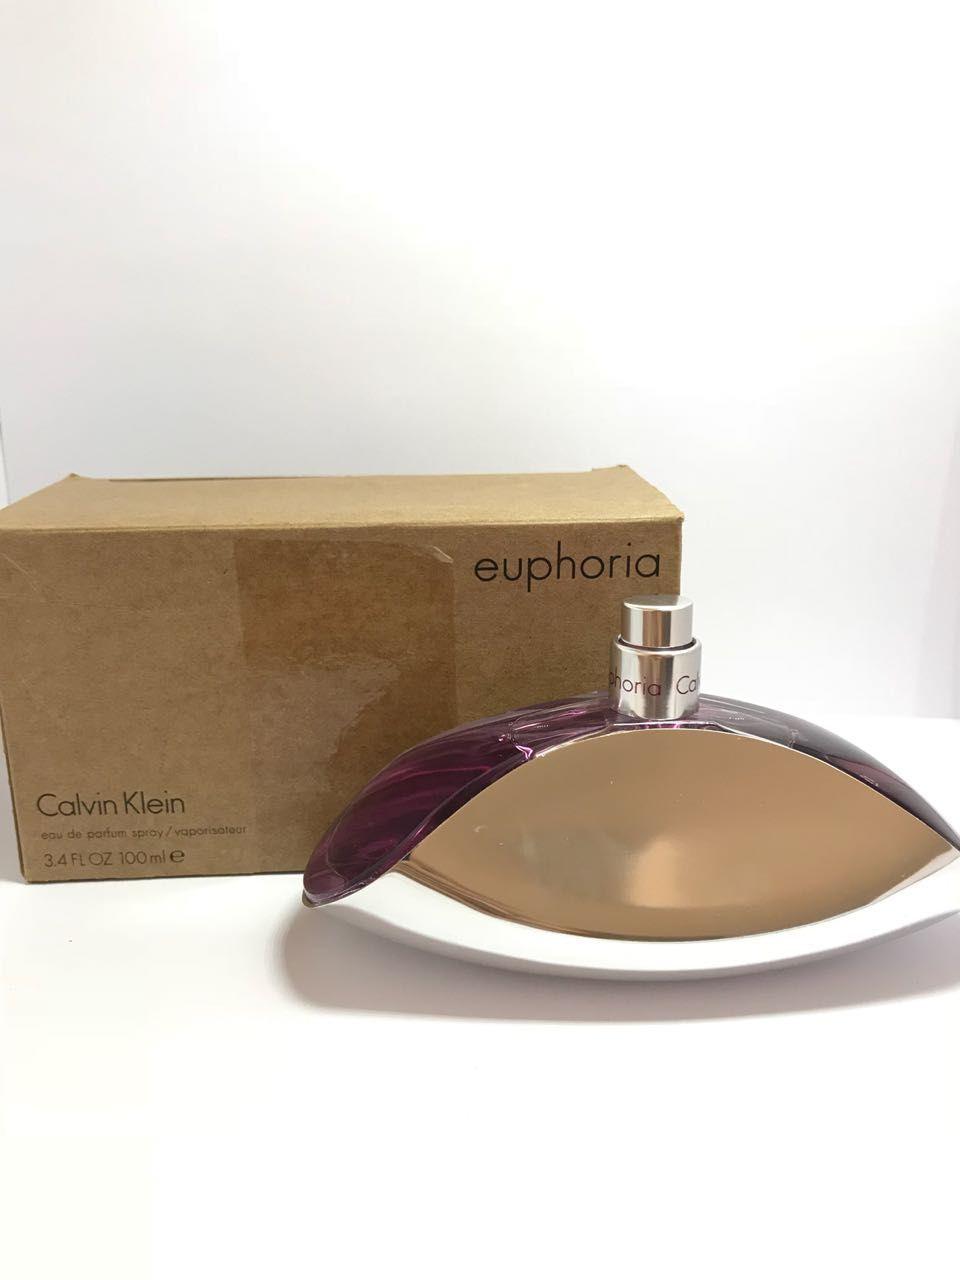 Euphoria Calvin Klein Feminino Eau de Parfum 100ML - Tester